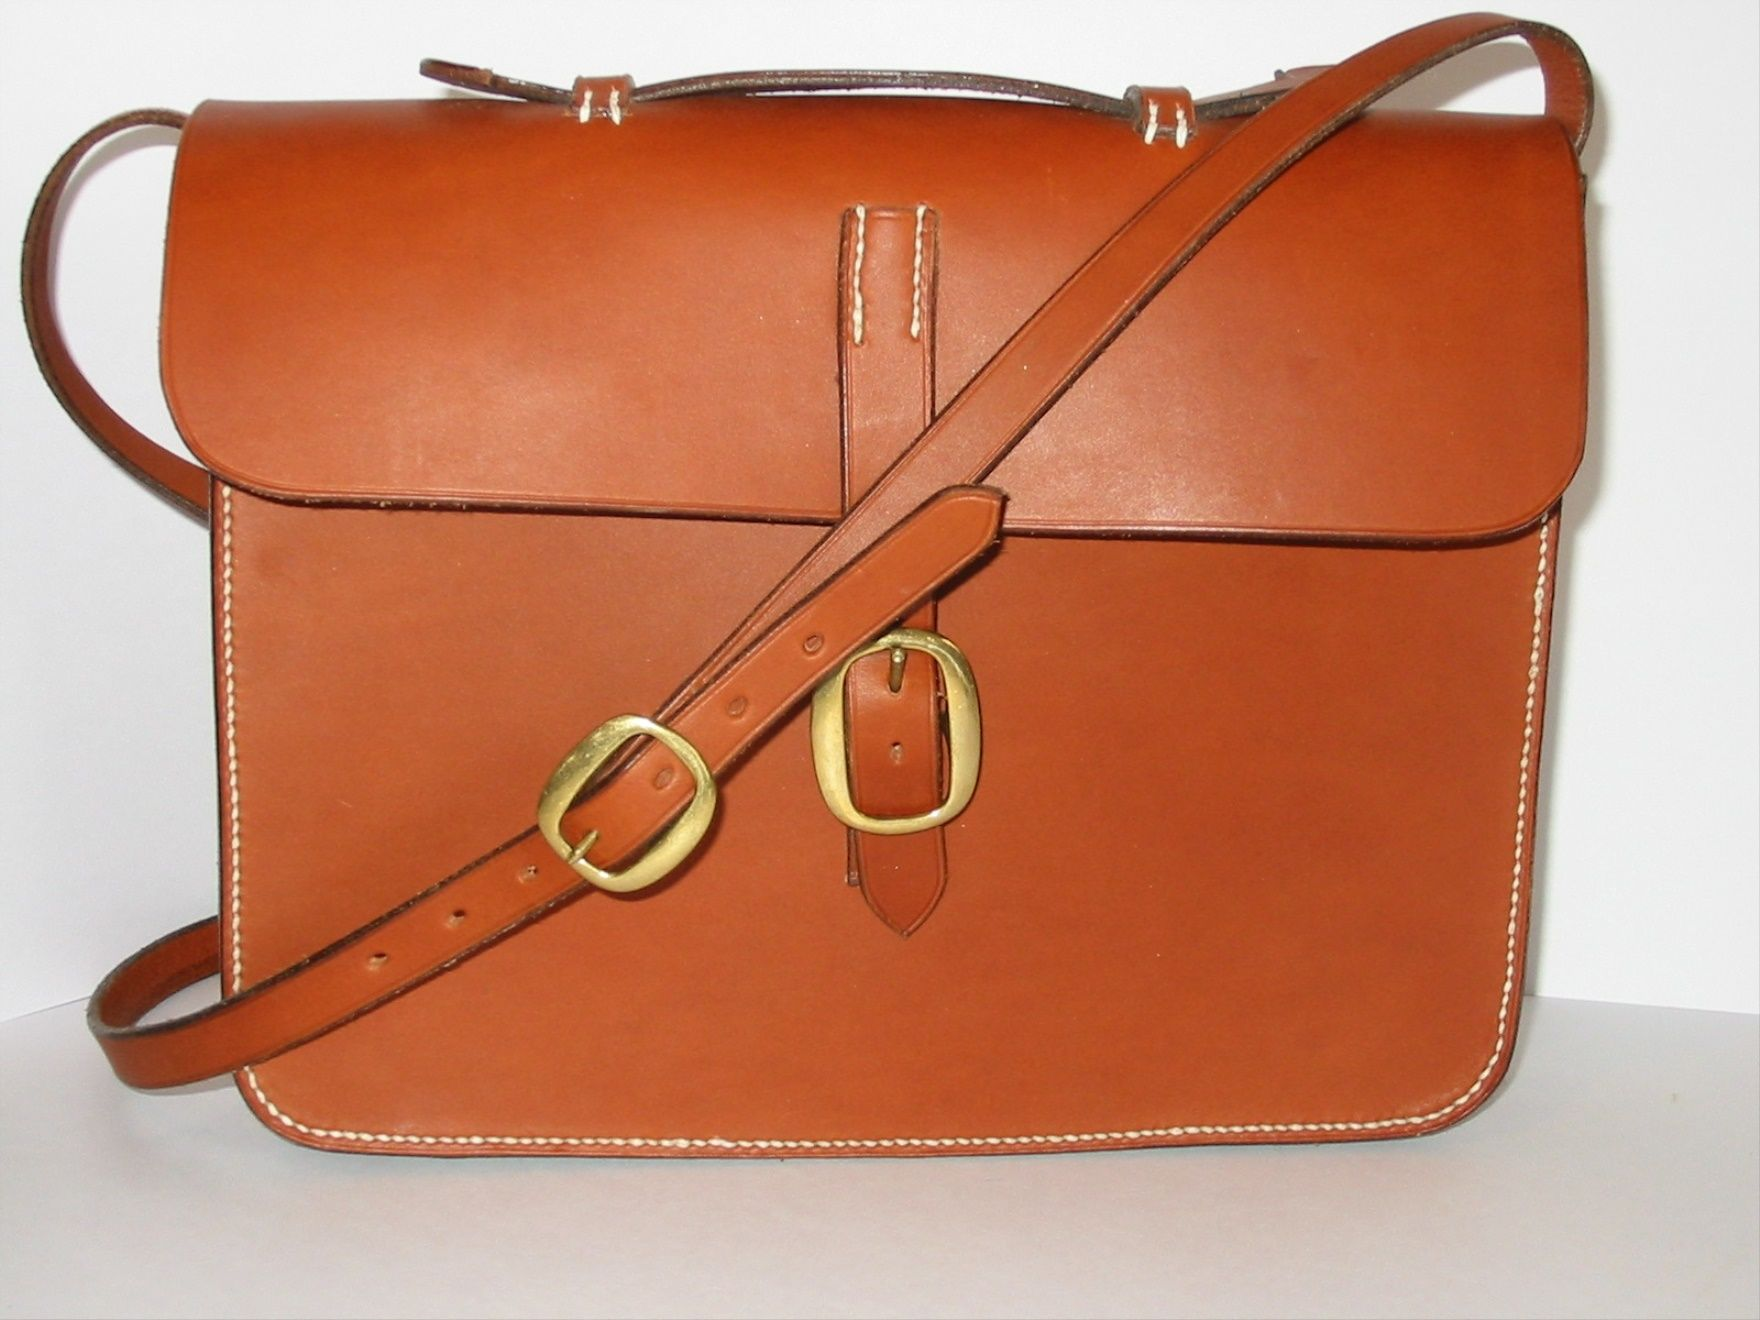 Leather Bags Handmade Handbags Uk Italian